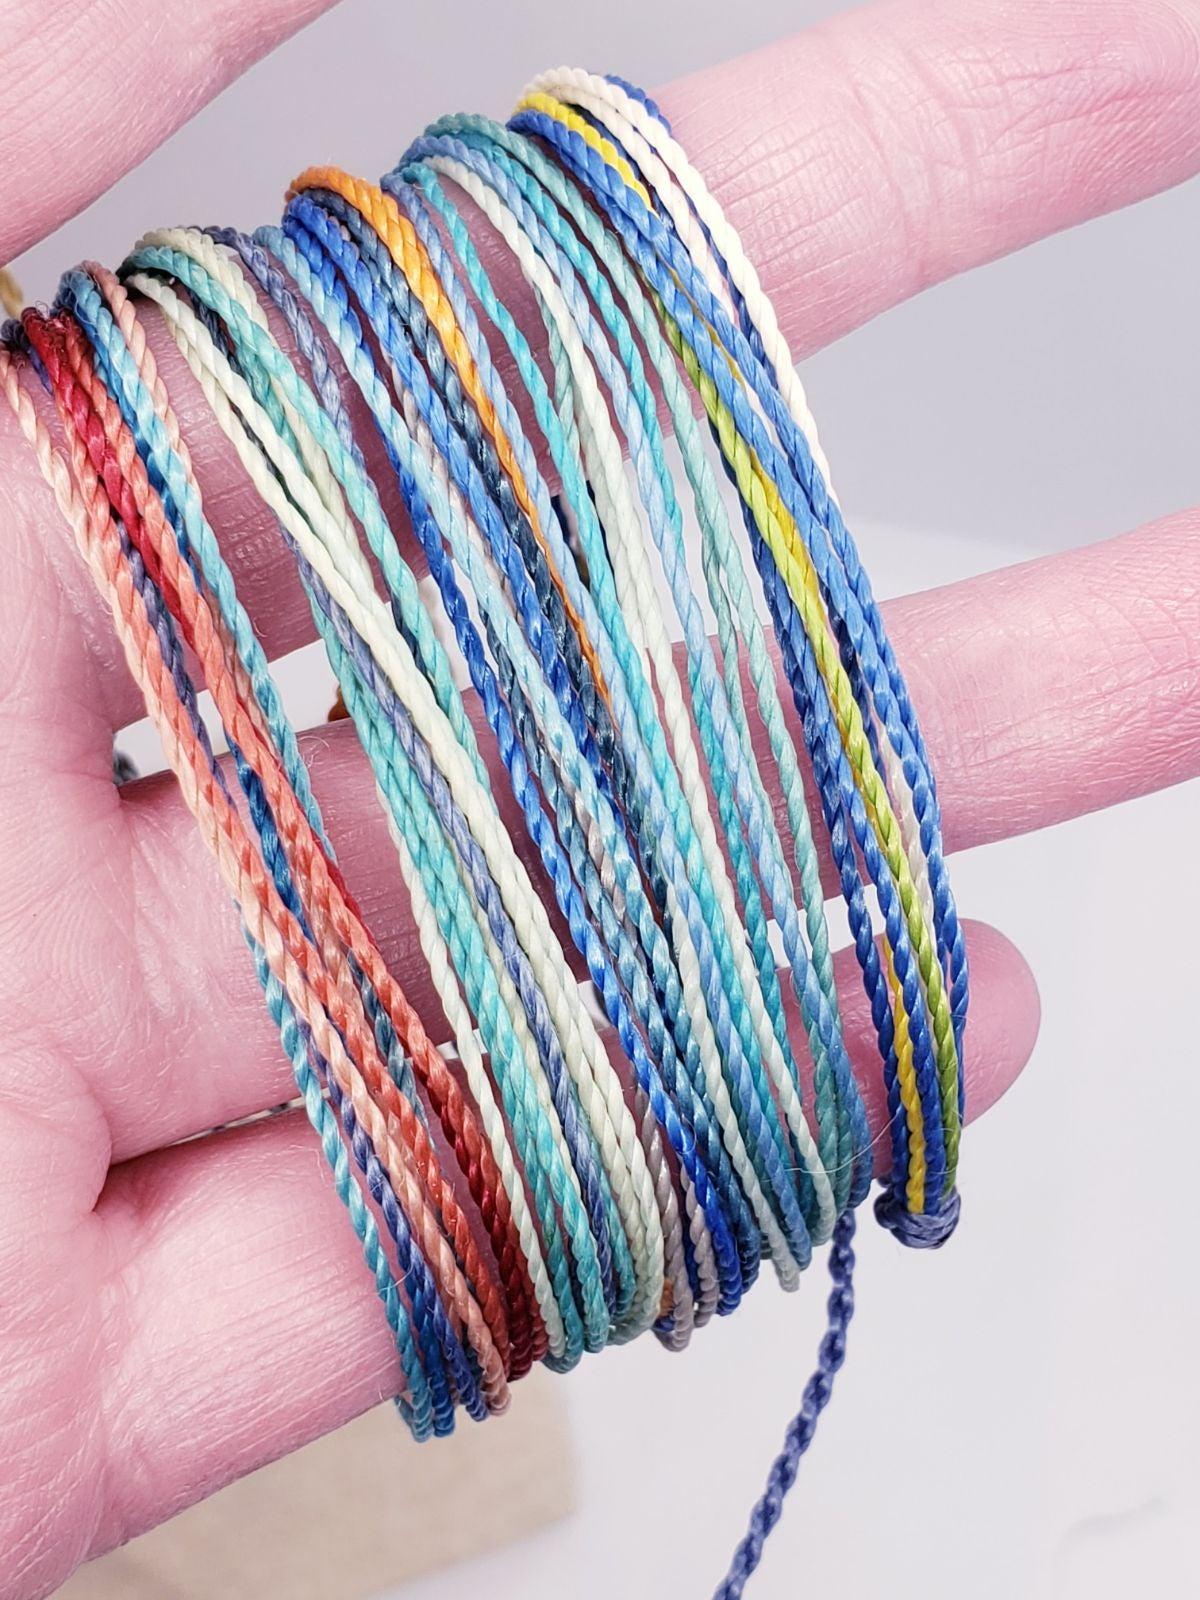 5 Pura Vida bracelets